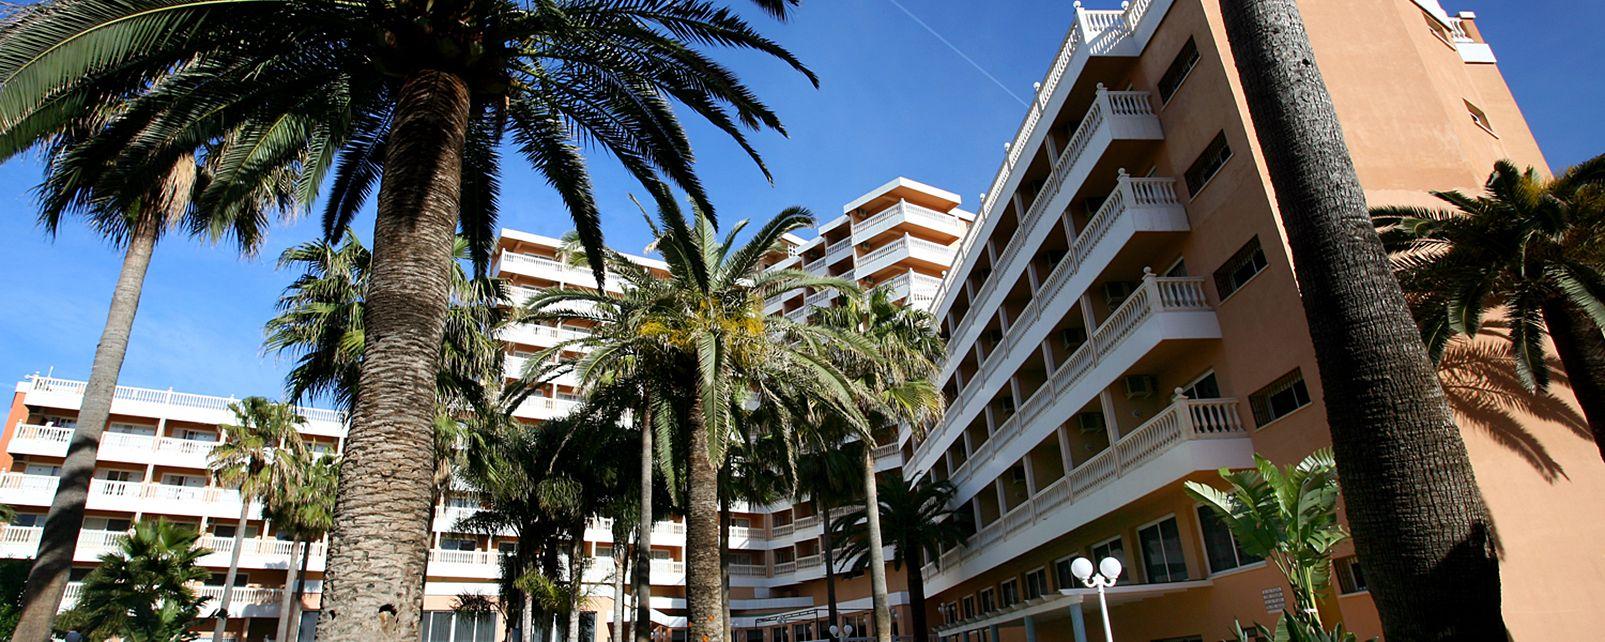 Hôtel Parasol Garden